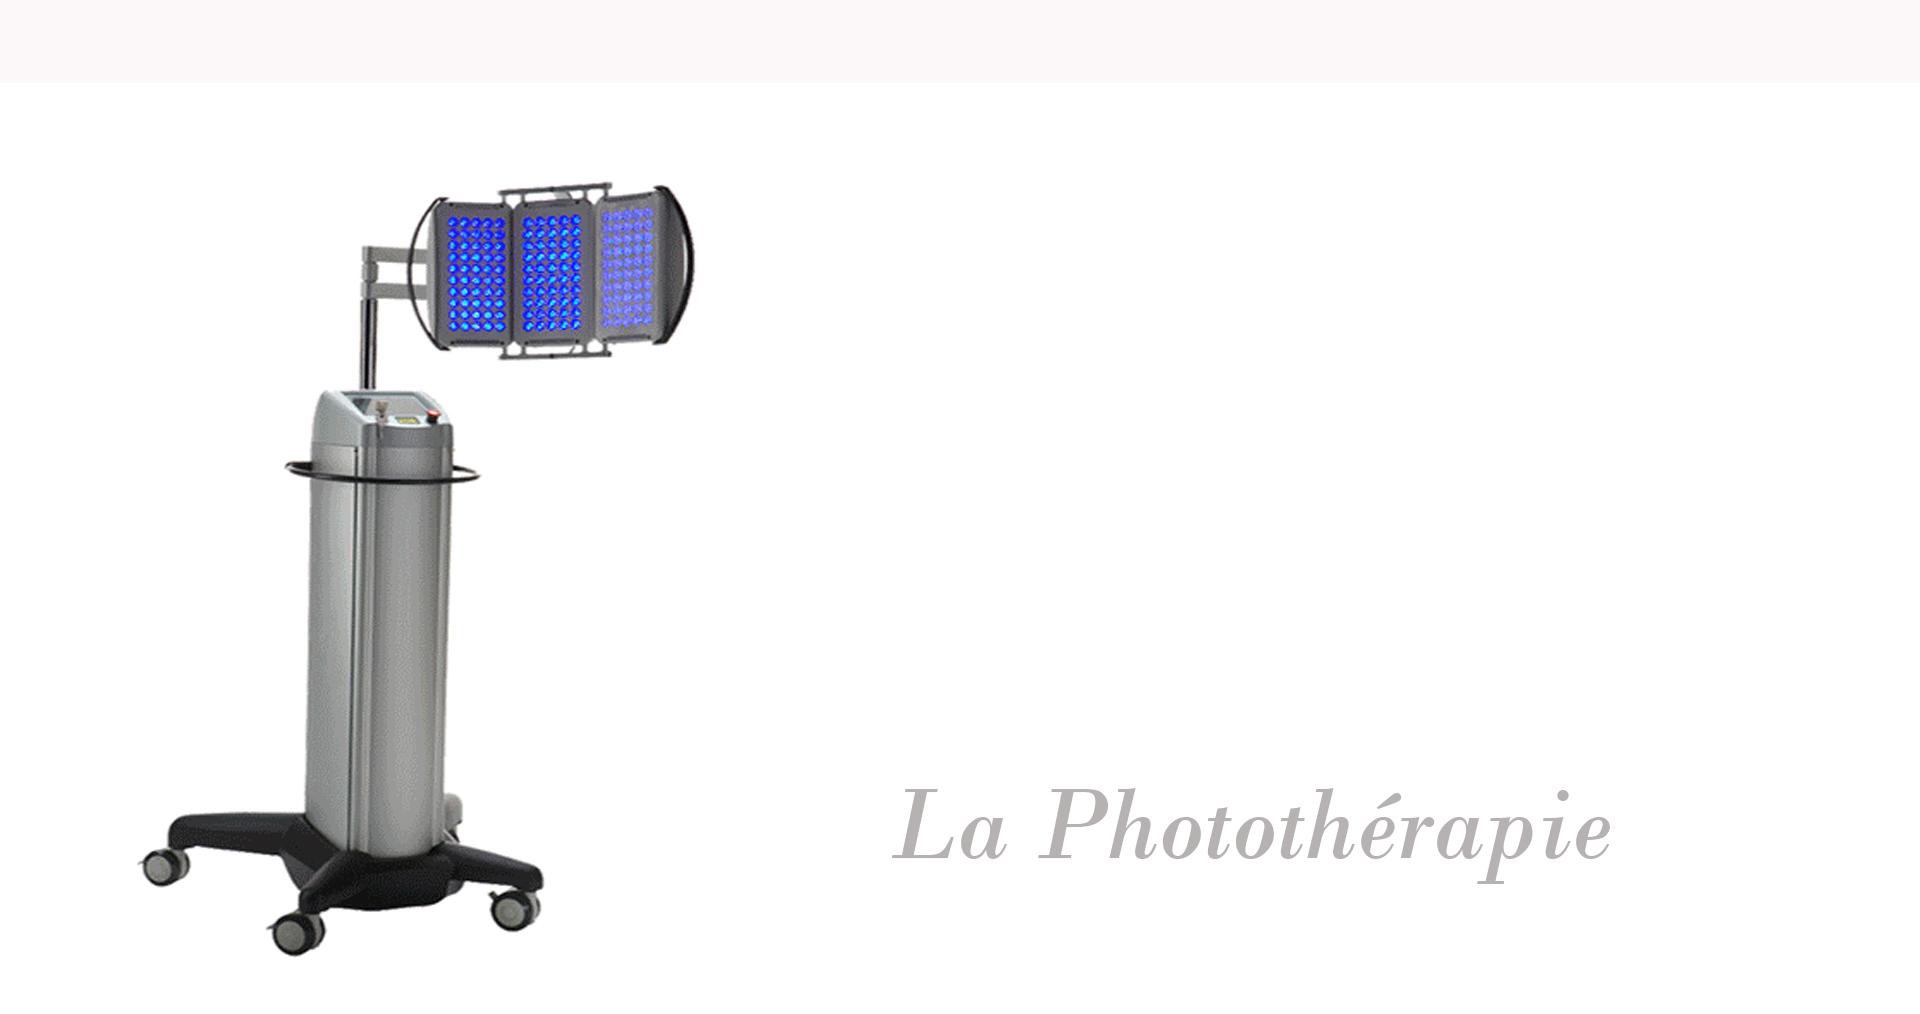 soins de phototherapie gracia institut